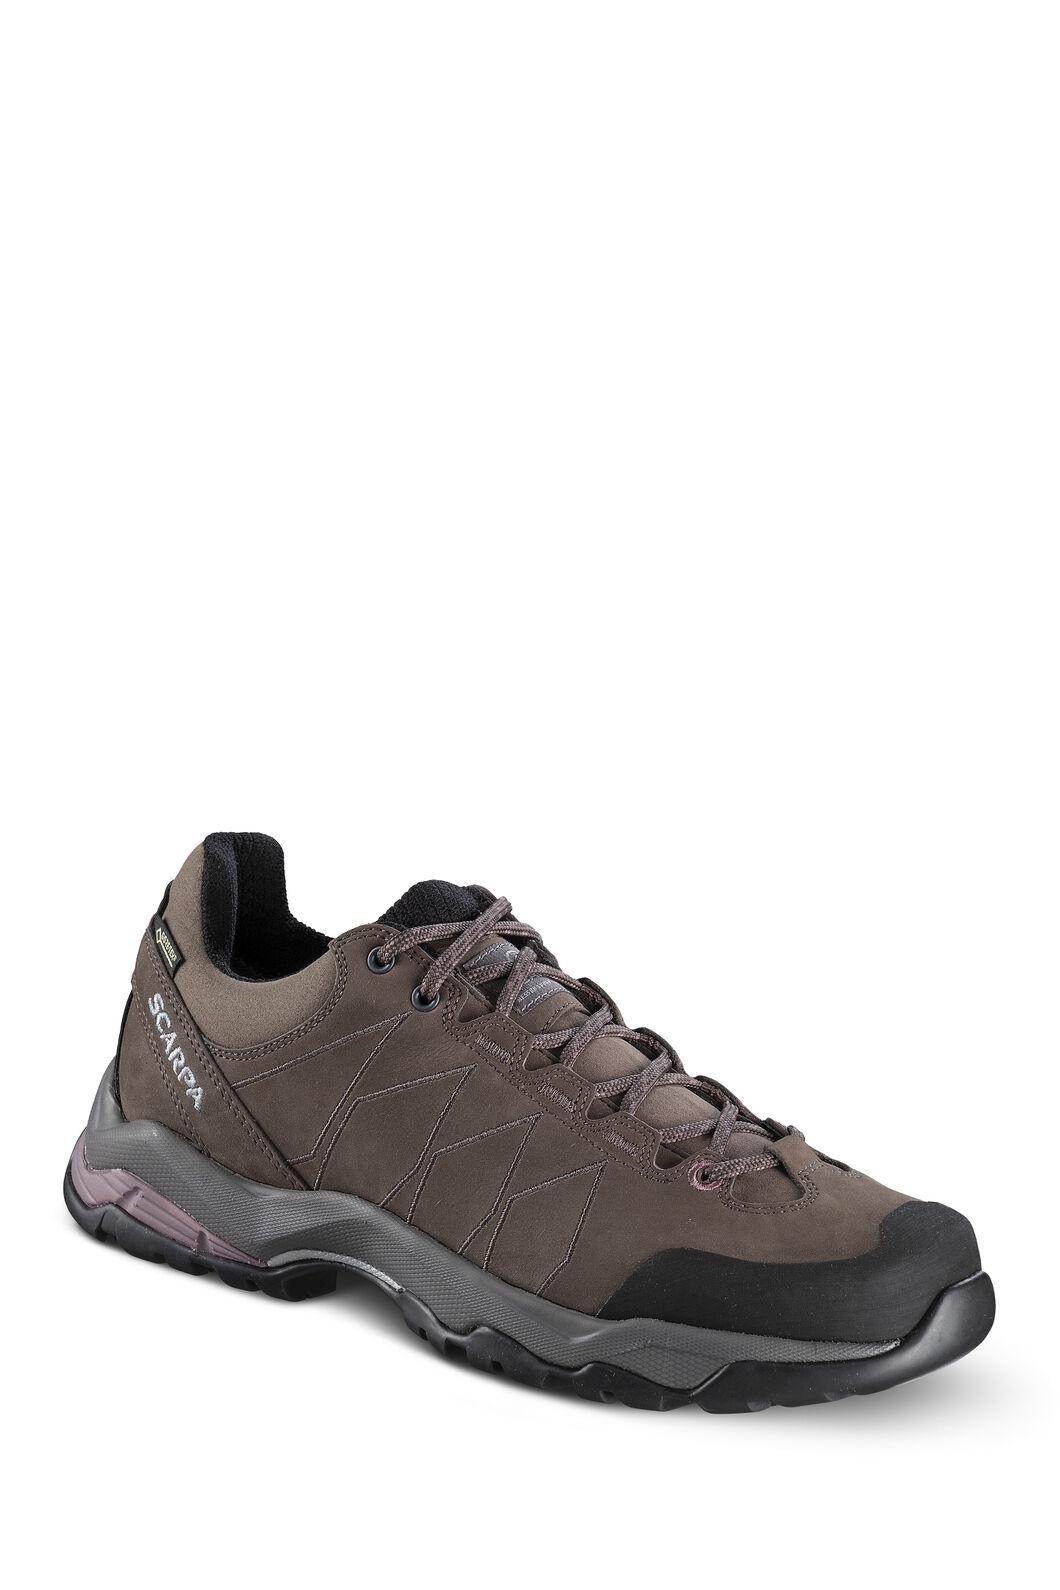 Scarpa Moraine Plus GTX Hiking Shoes - Women's, Charcoal/Dark Plum, hi-res